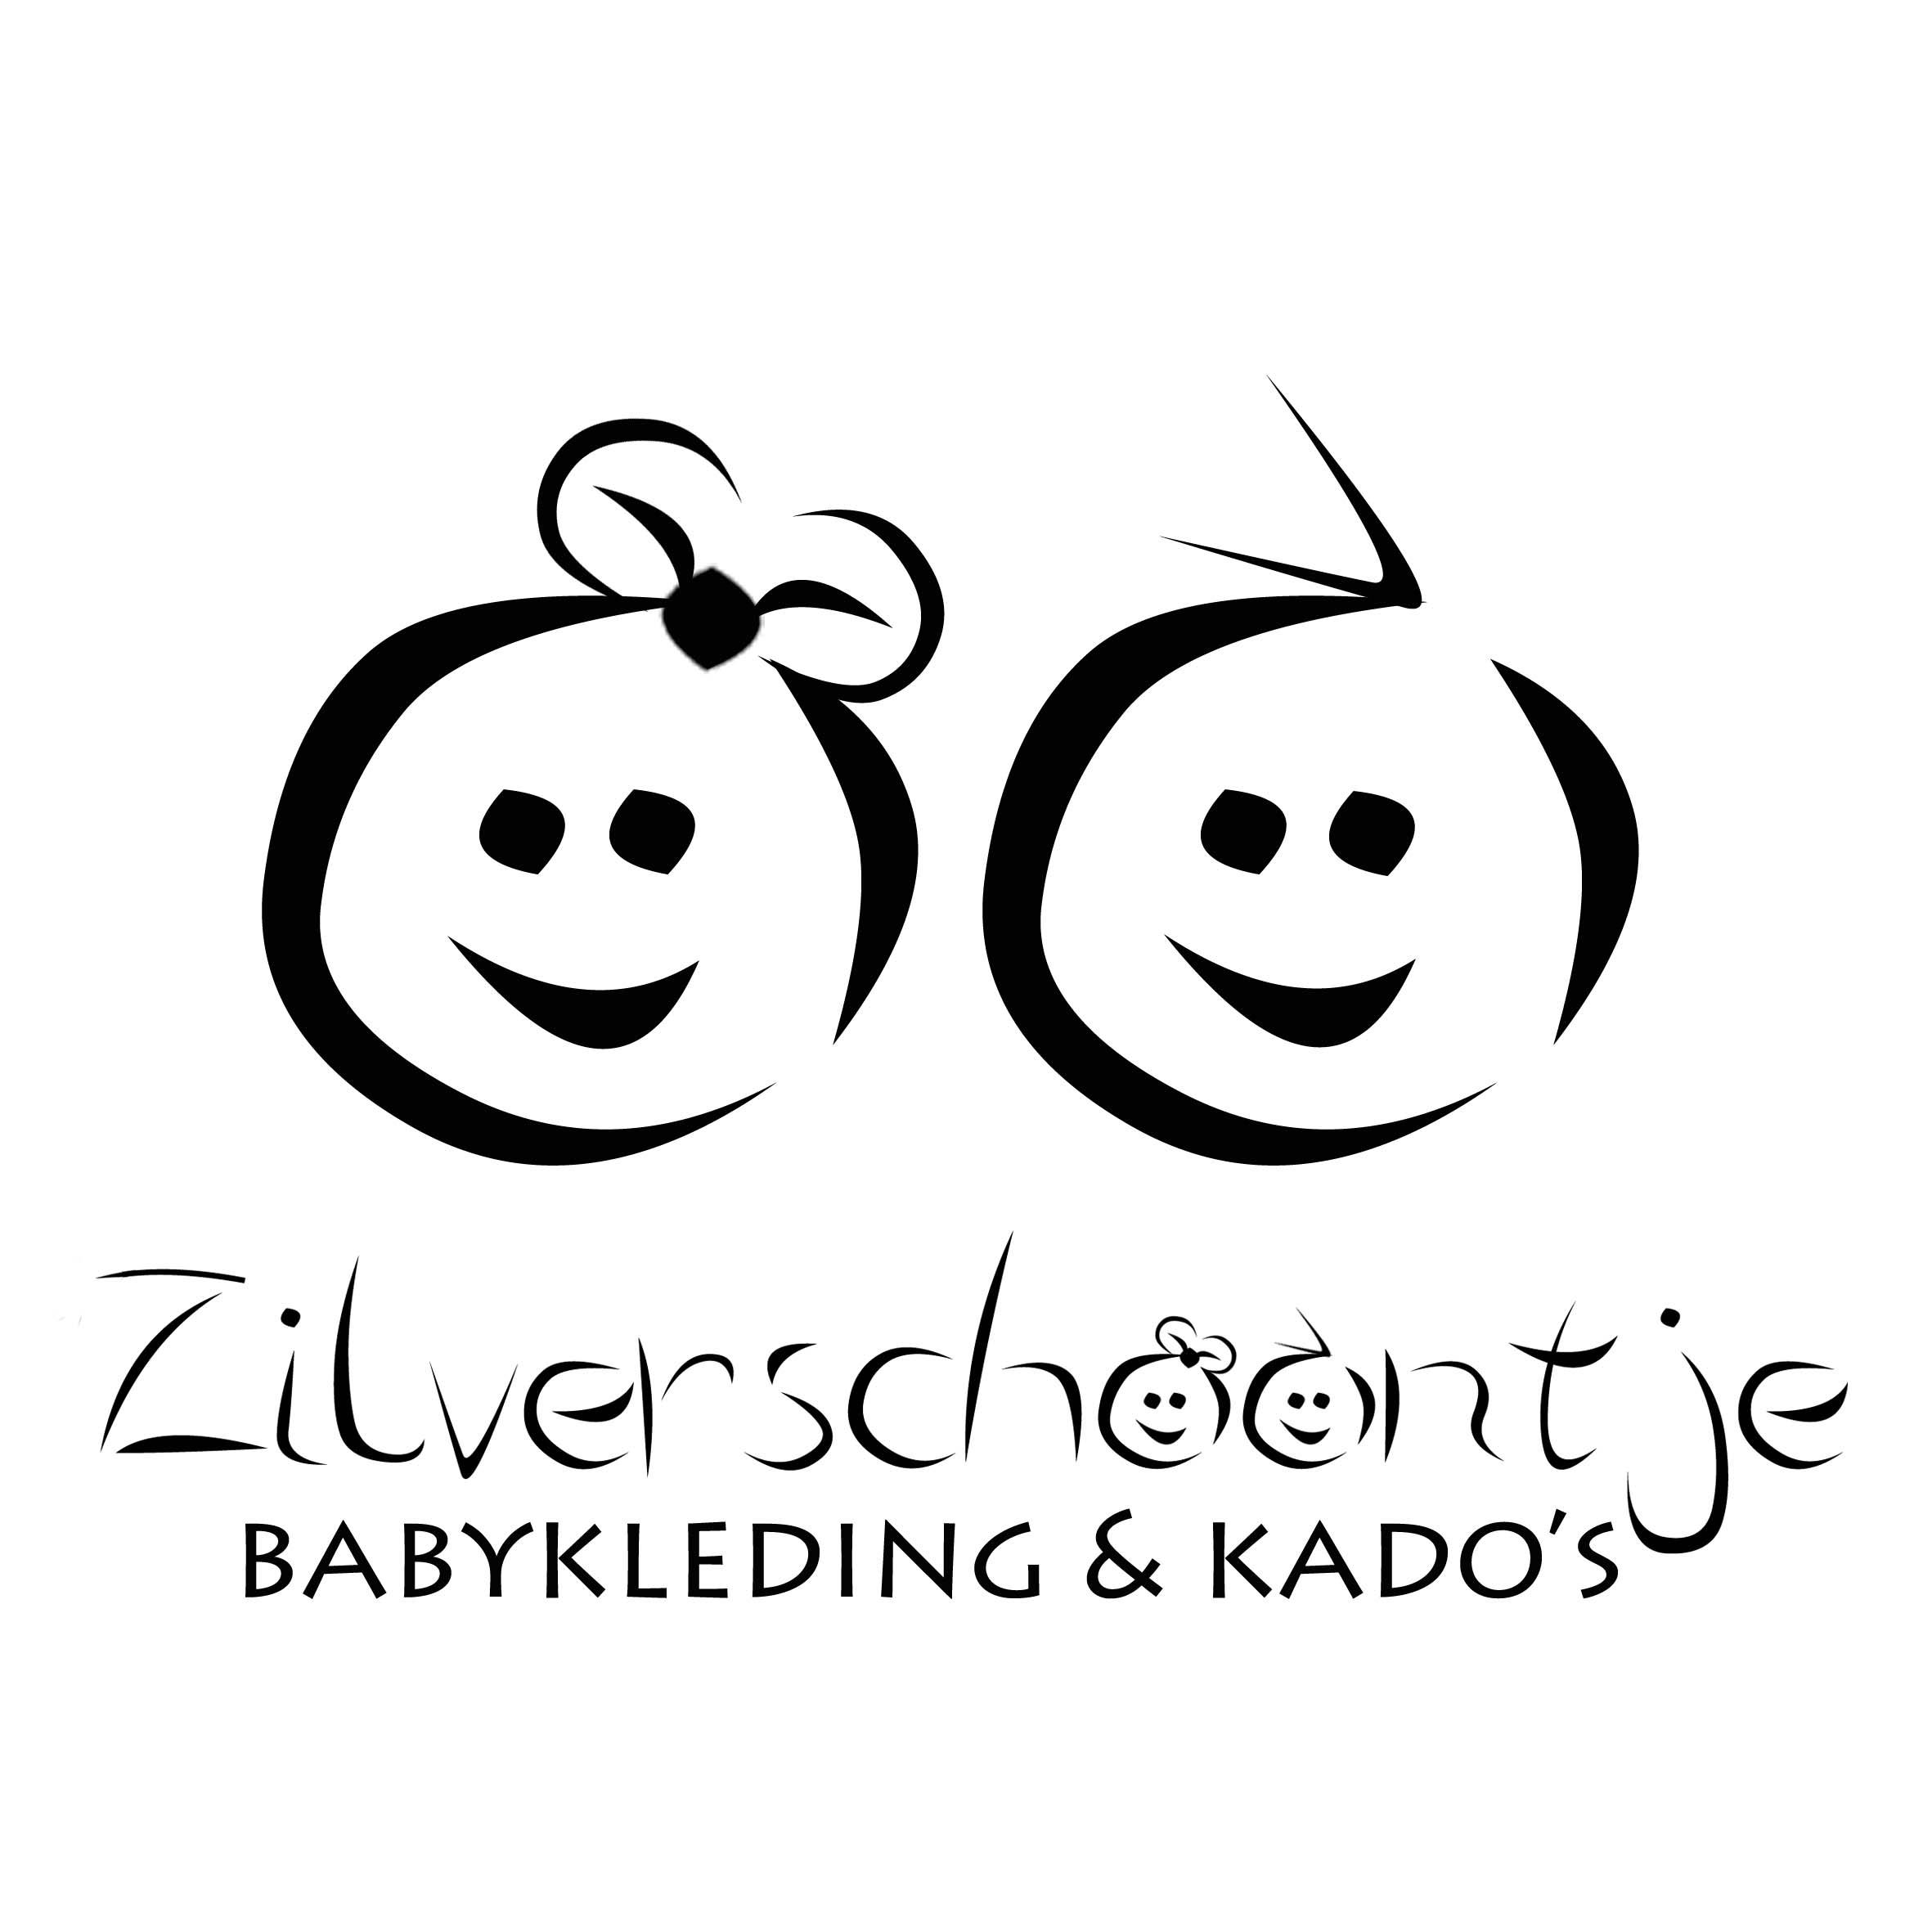 Zilverschoontje Babykleding & Kado's